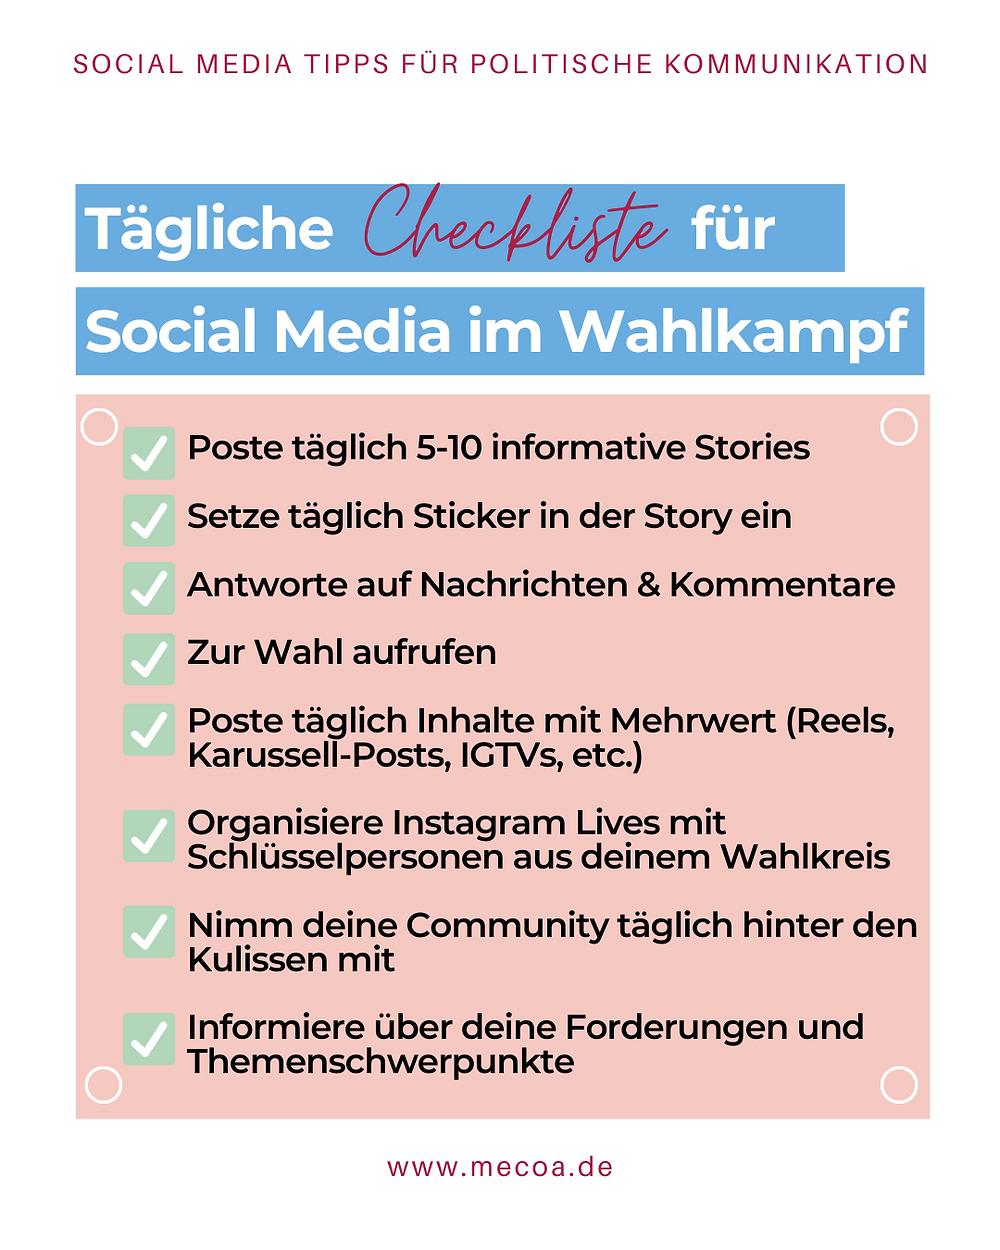 Tägliche Checkliste für Social Media im Wahlkampf